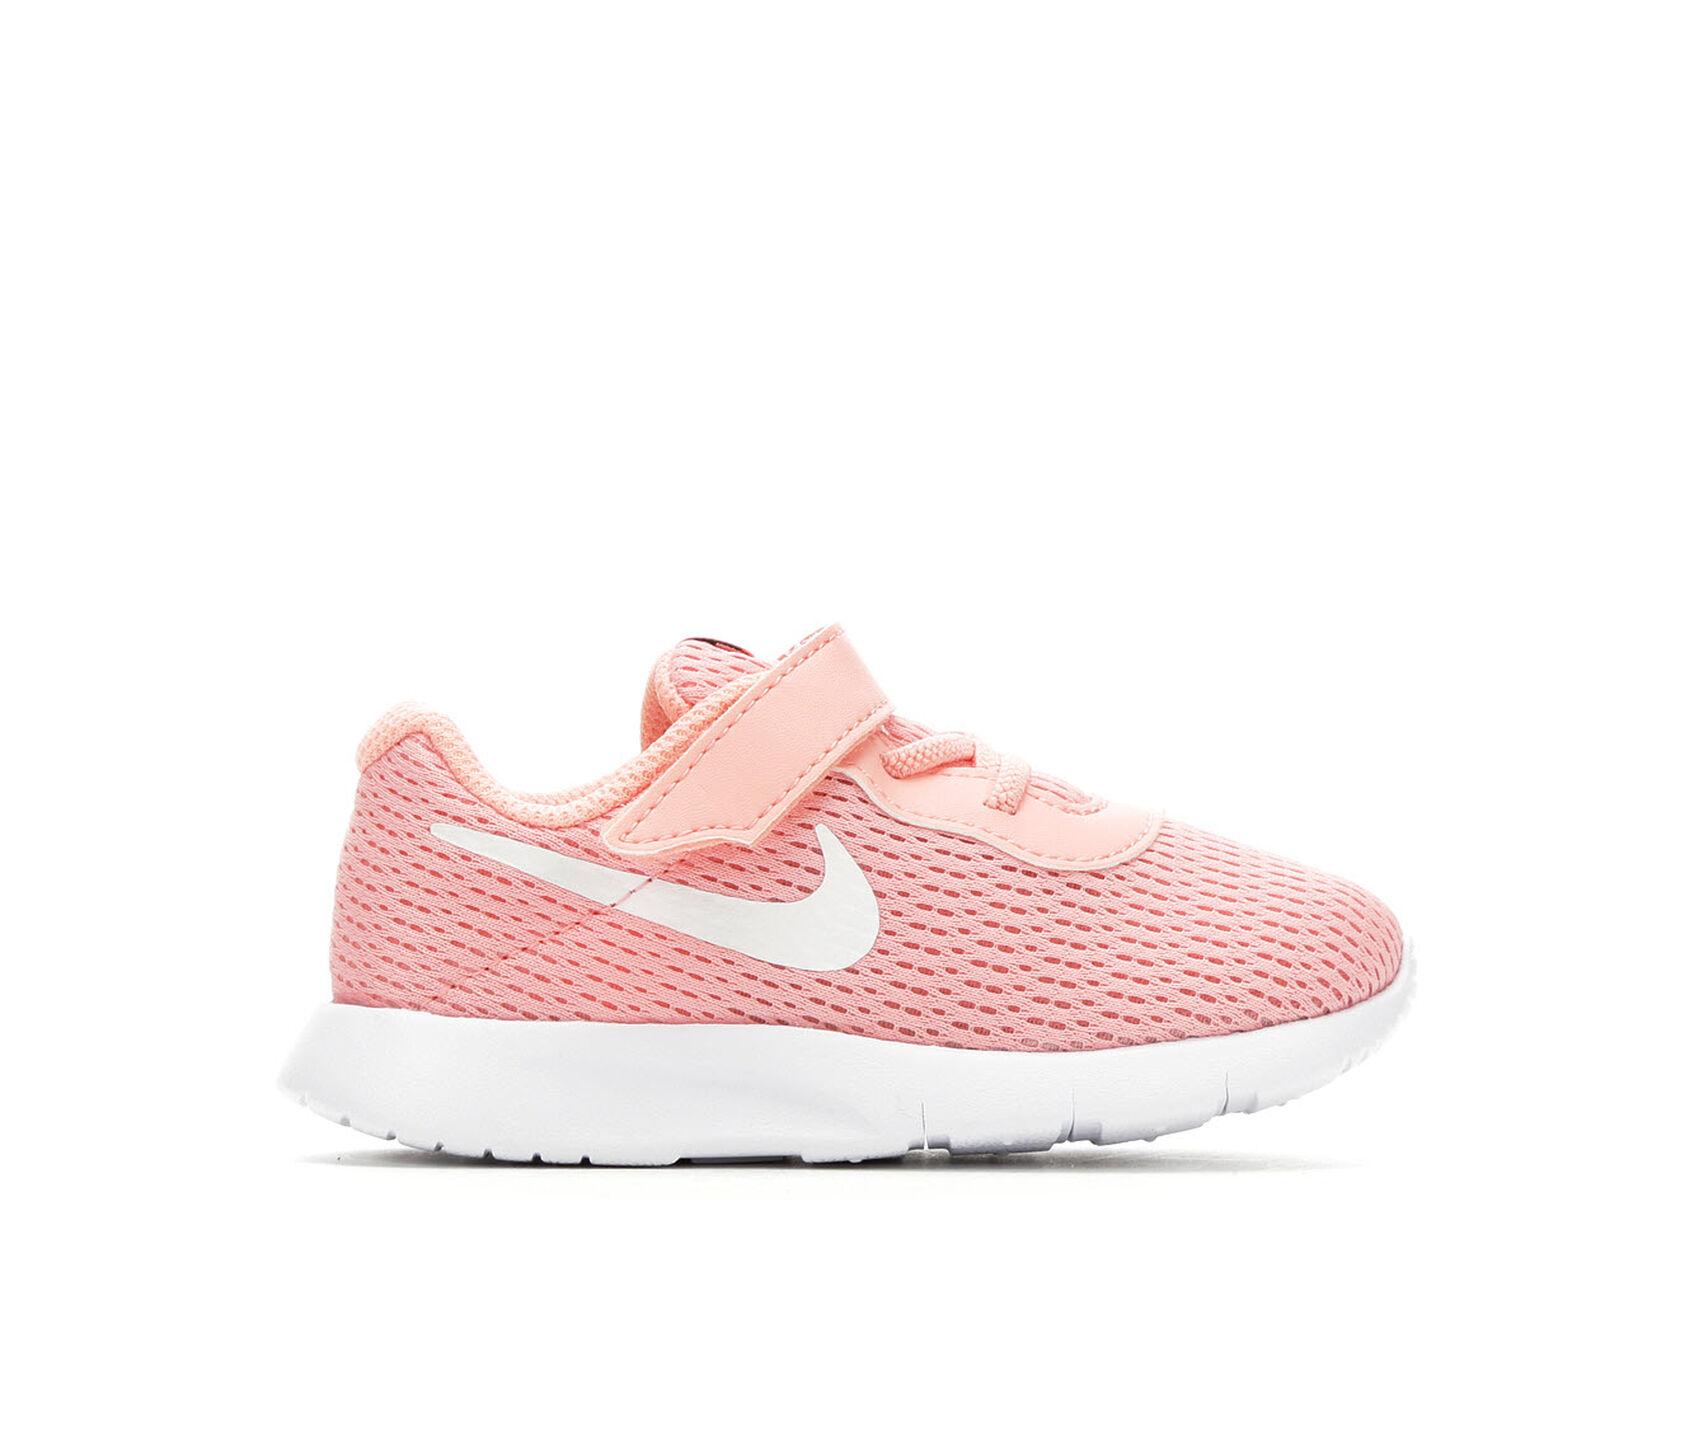 70c672eb94 Girls' Nike Infant & Toddler Tanjun Sneakers | Shoe Carnival